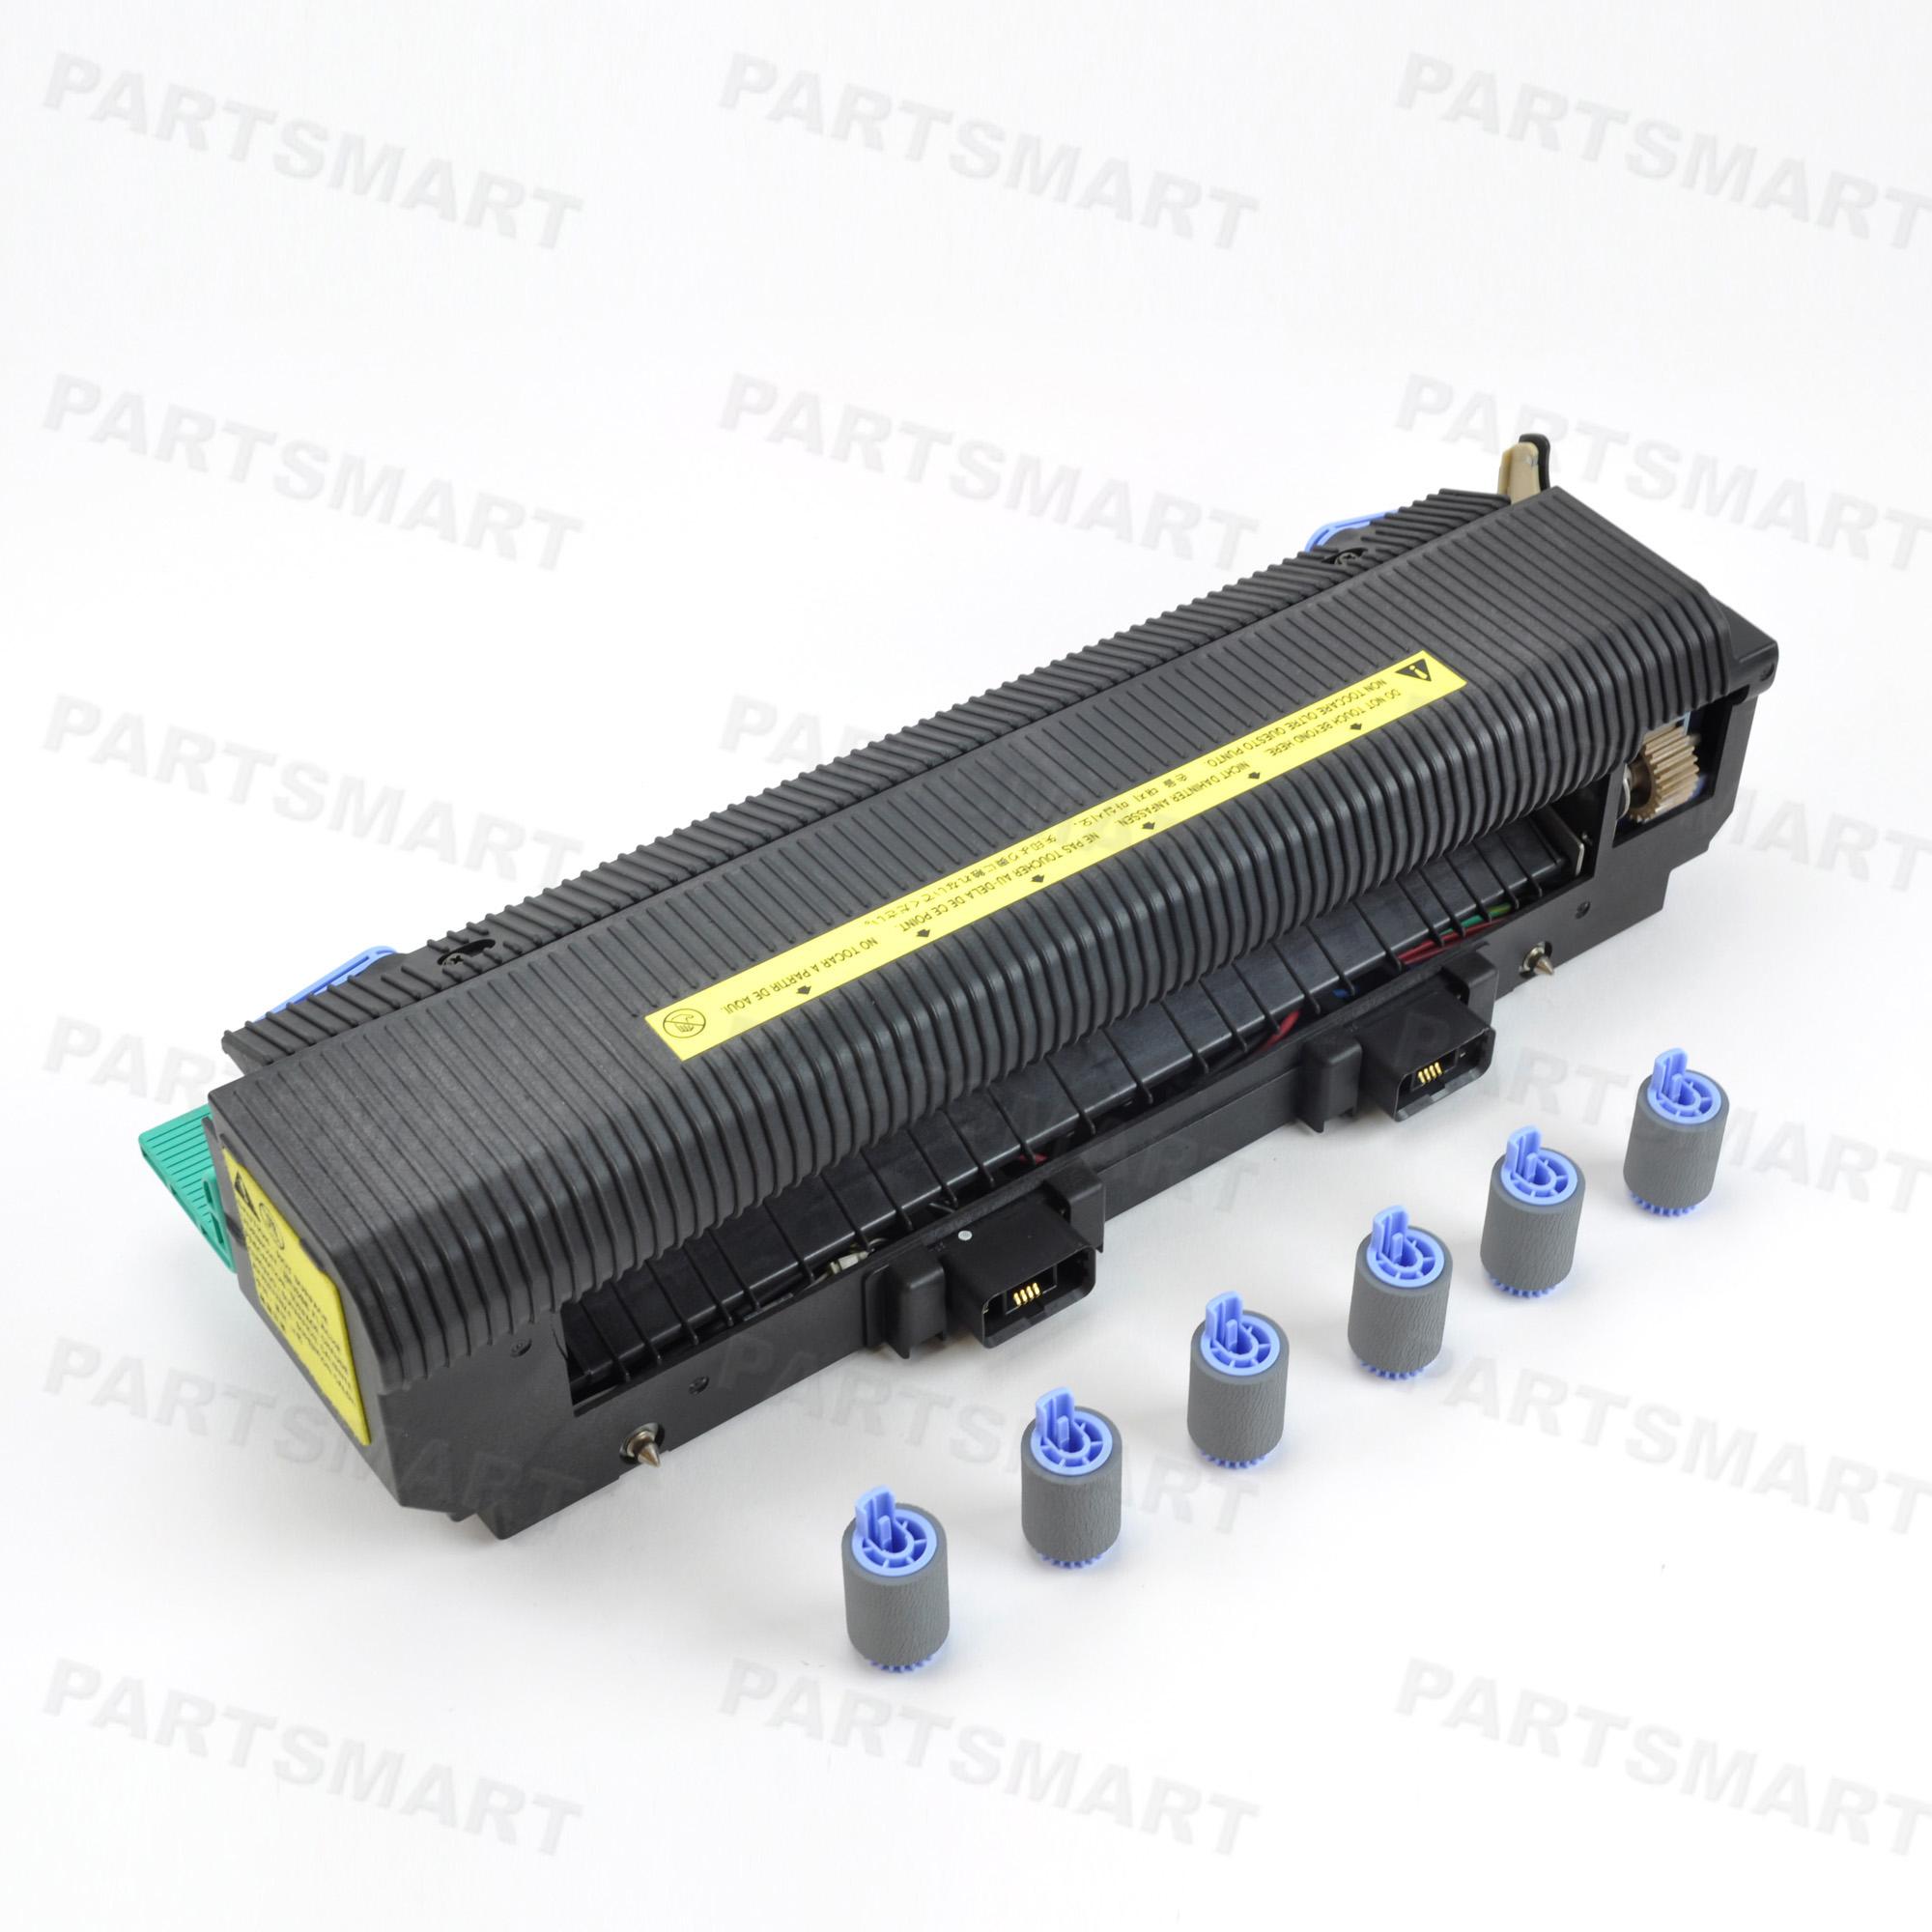 Partsmart Maintenance Kit for HP Laserjet printers: HP850...